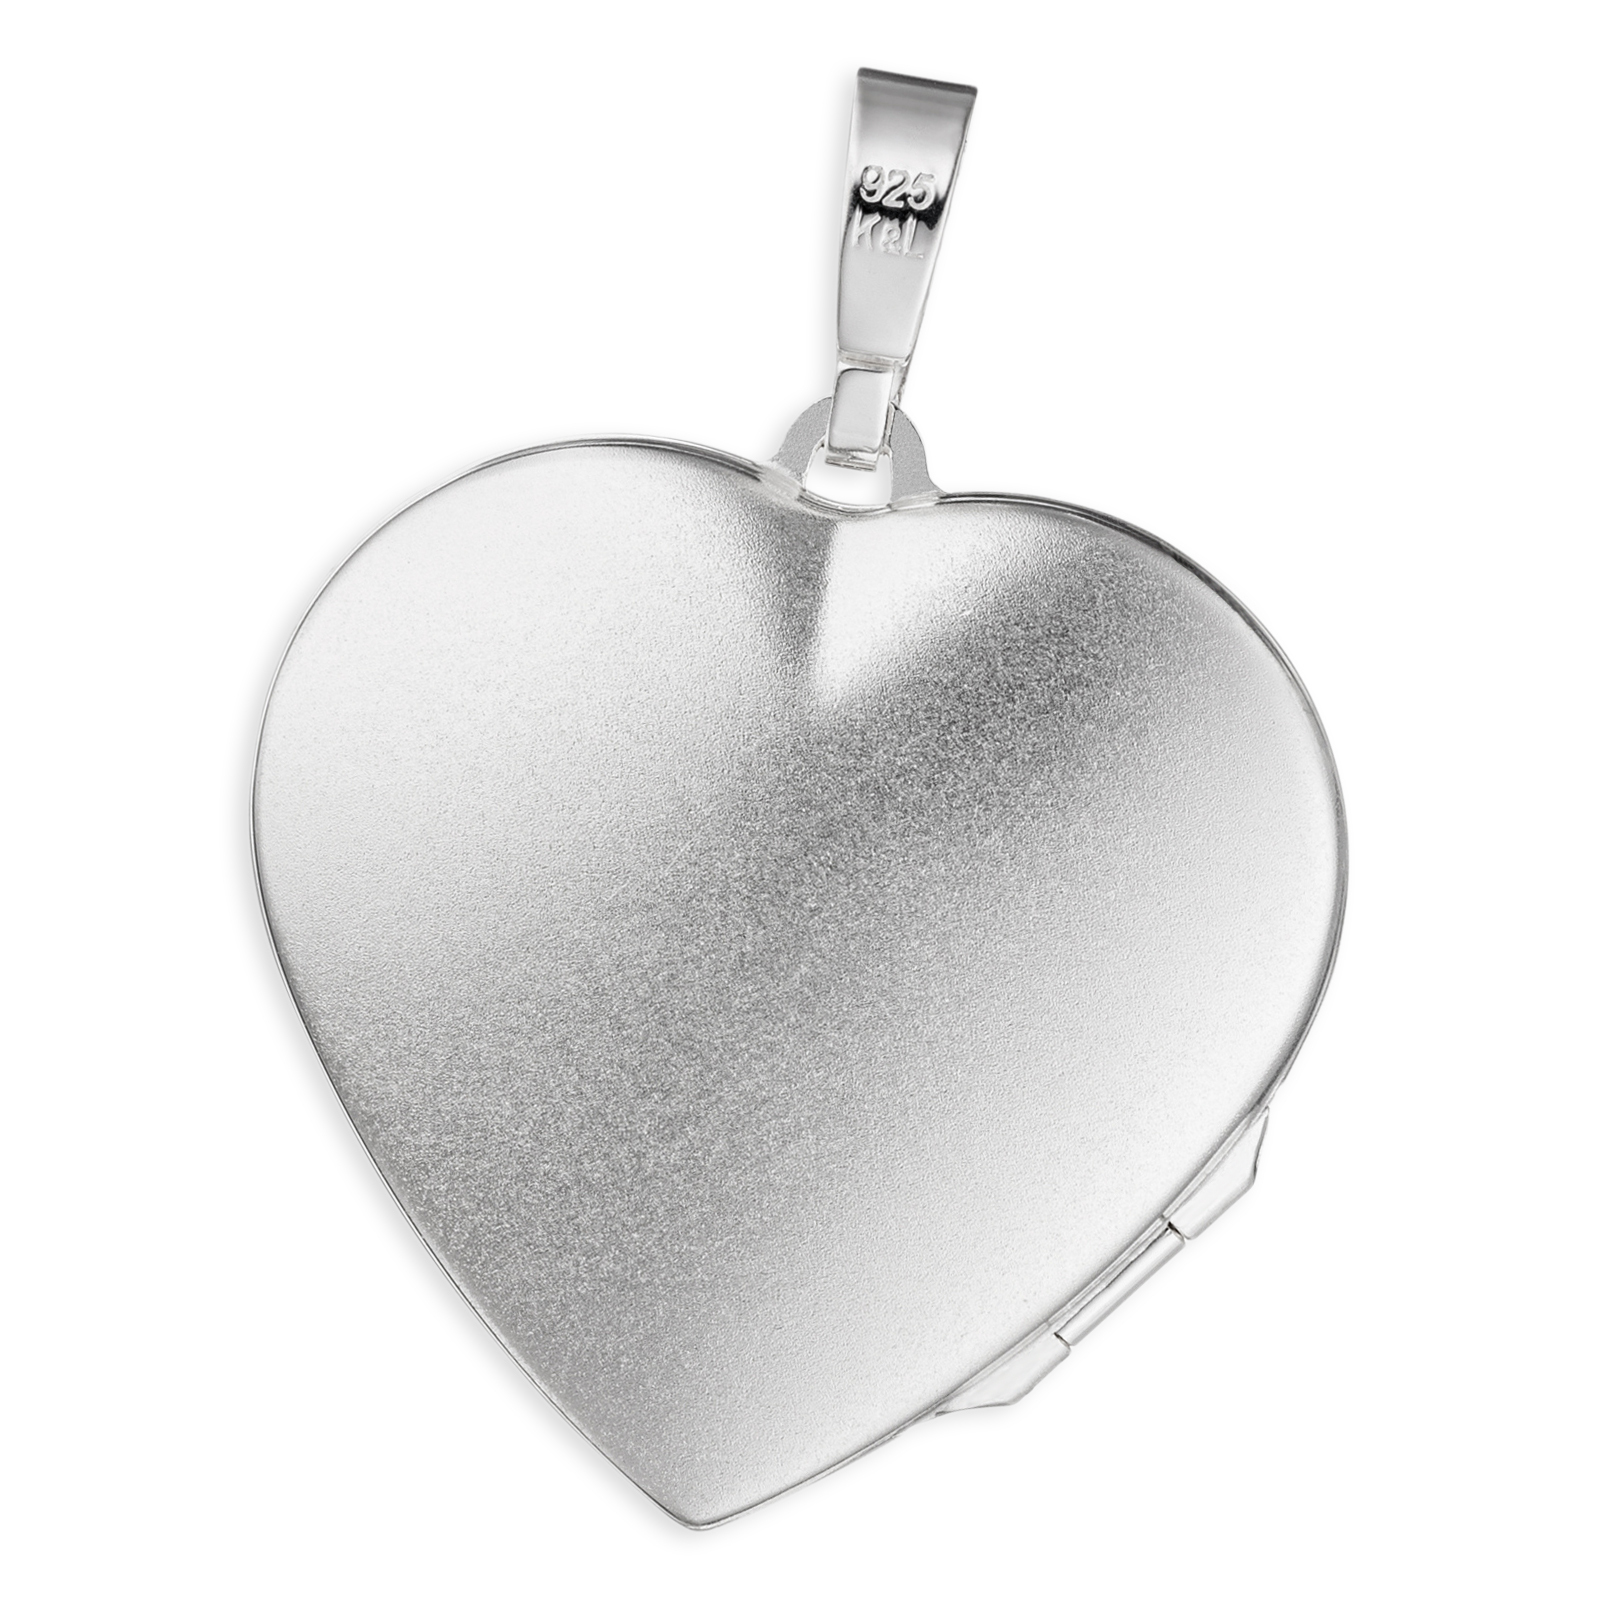 Medaillon Herz hochglanz verziert 925 Perlmutt Silber für 2 Fotos + Kette, Etui